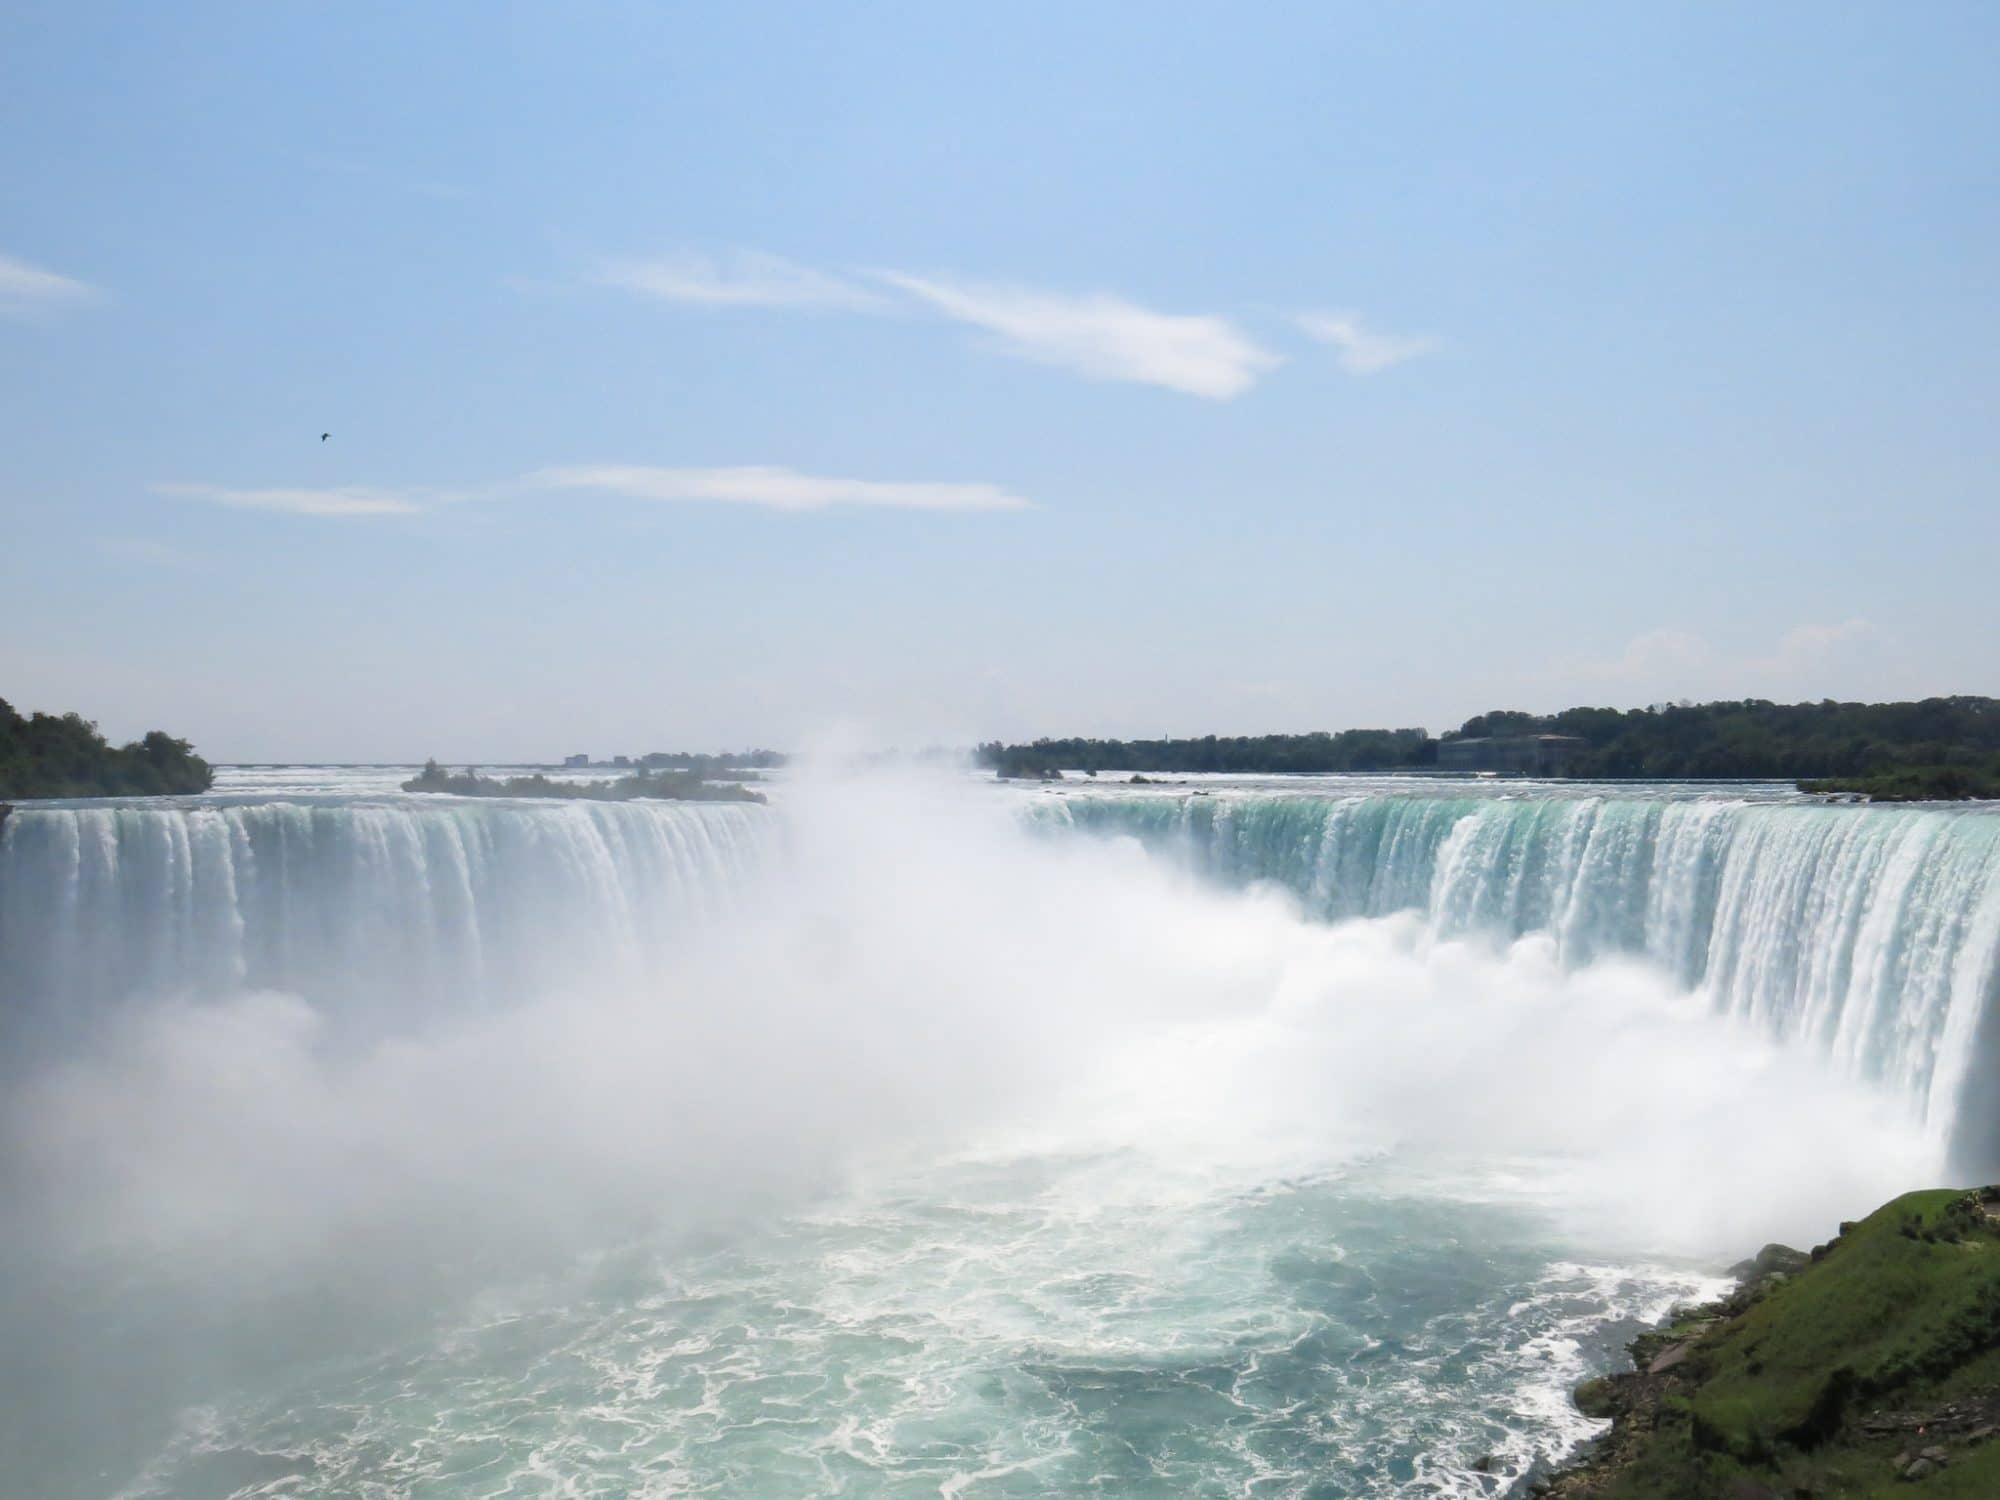 How The Horseshoe Falls Got Its Name